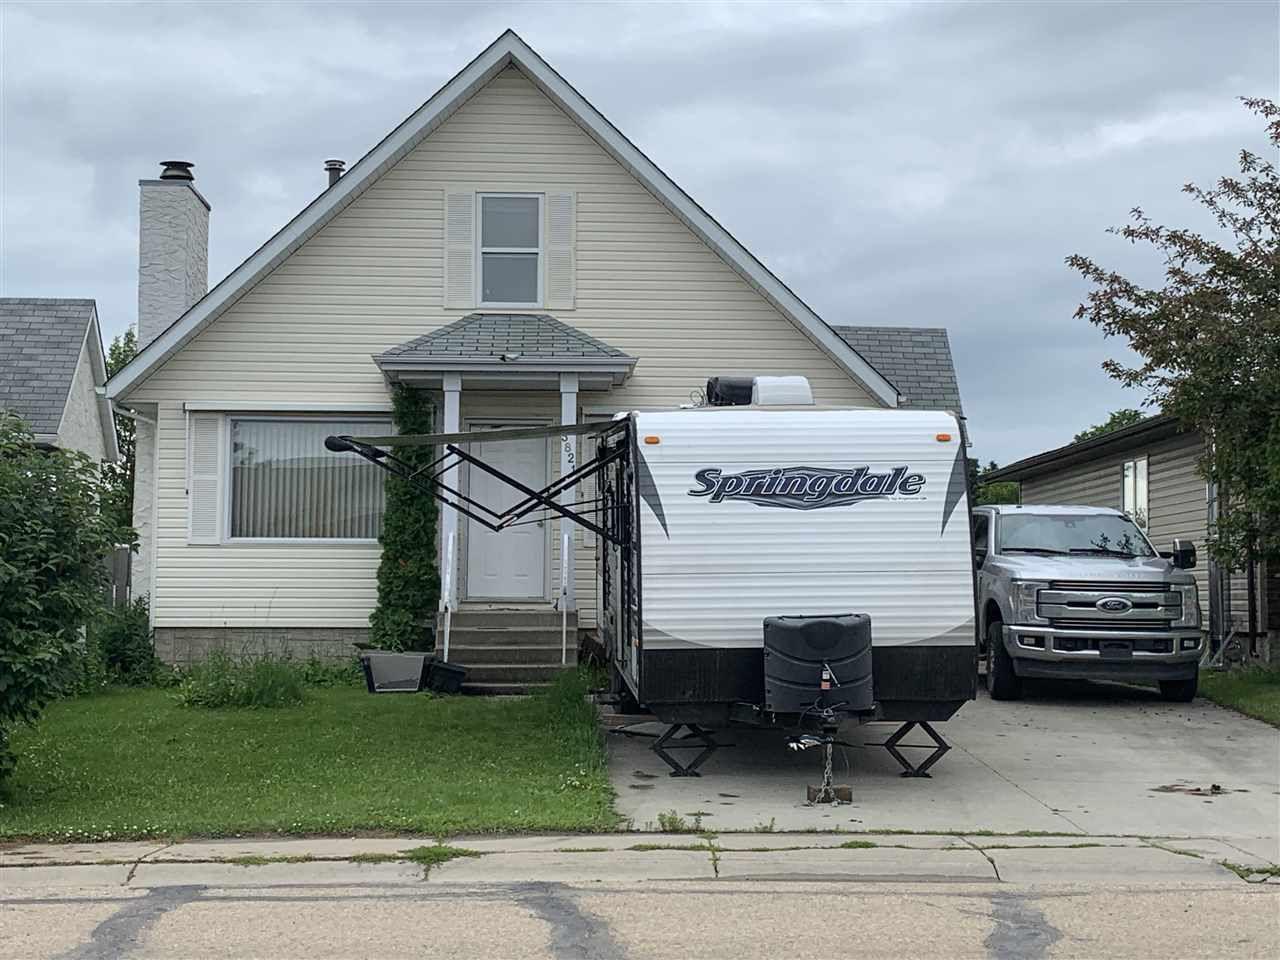 Main Photo: 5821 55 Street: Barrhead House for sale : MLS®# E4165178